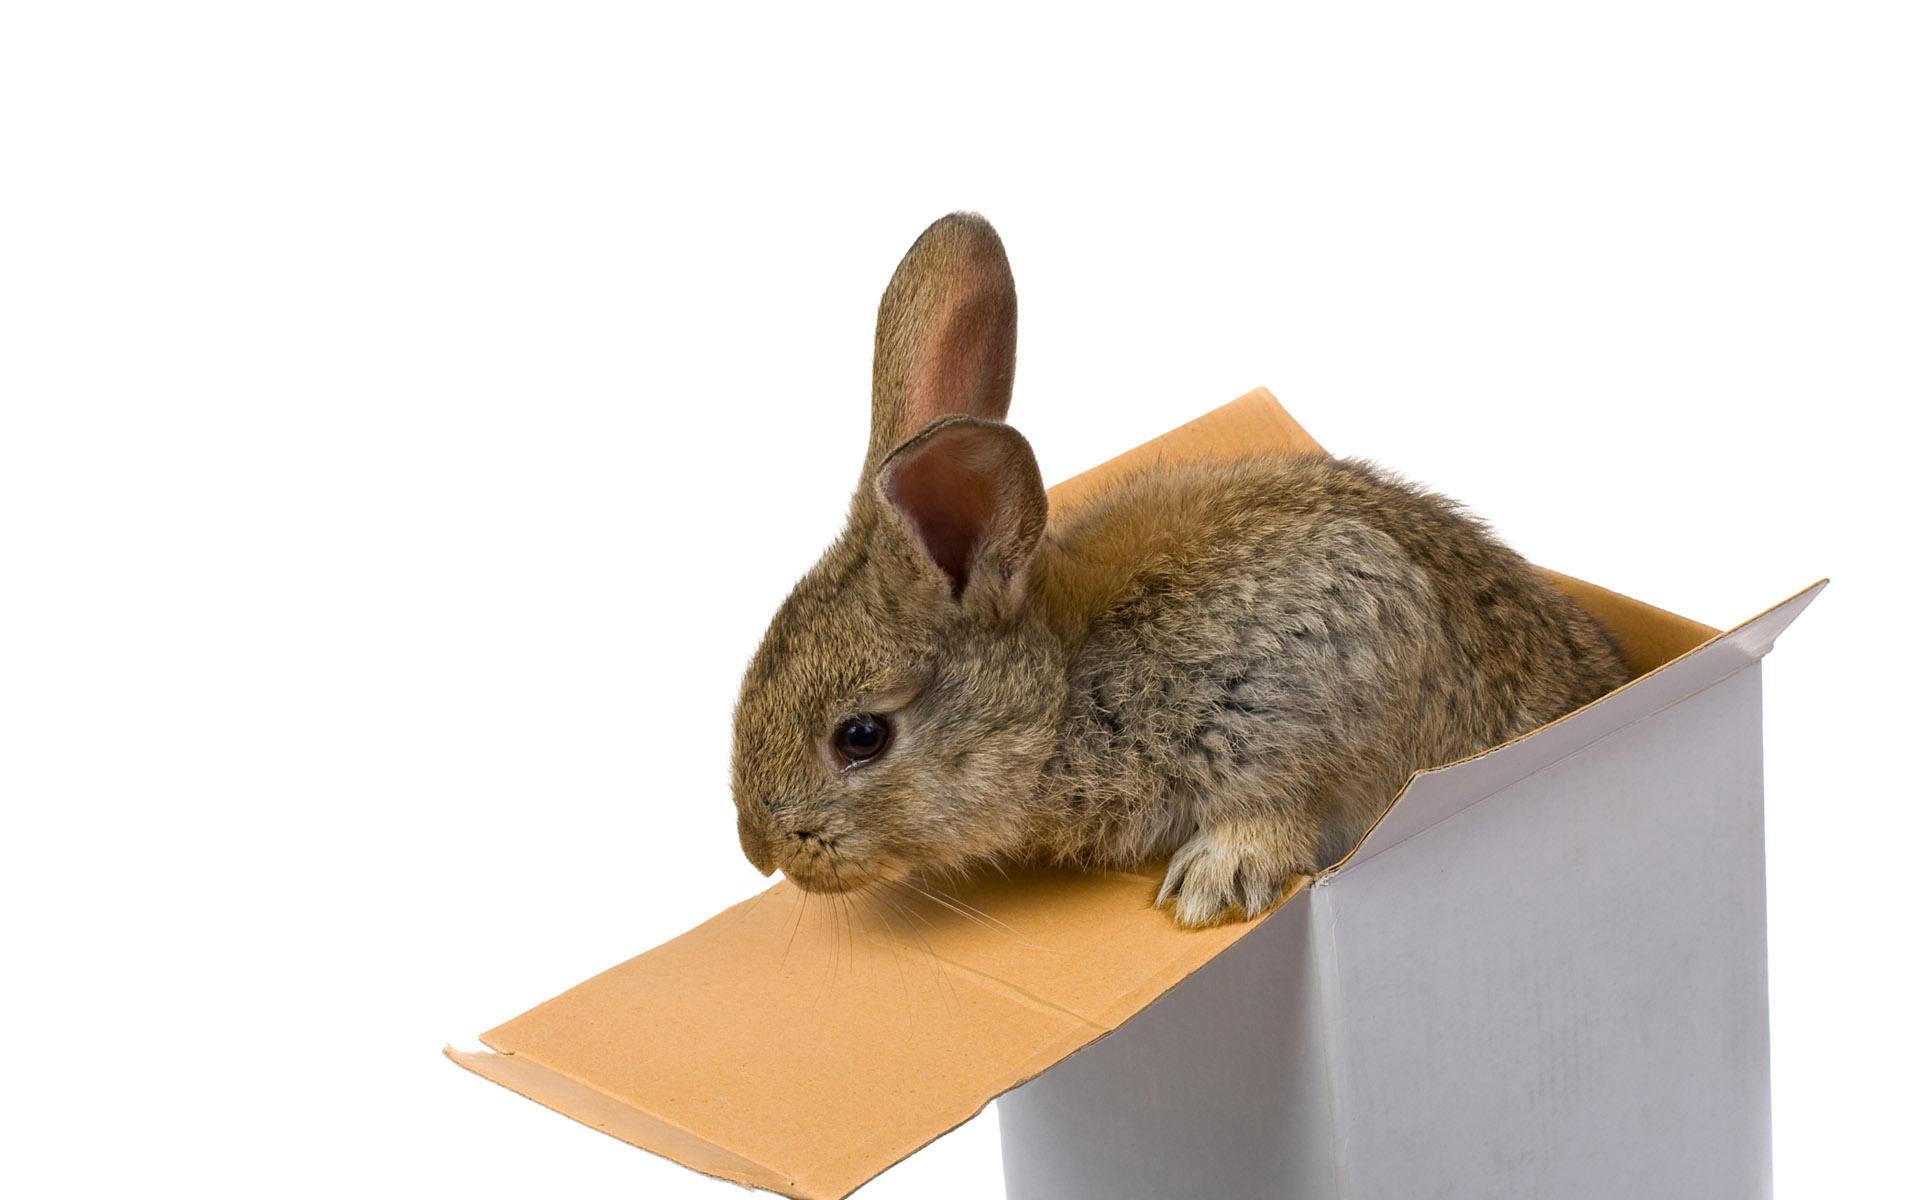 rabbit wallpapers free download